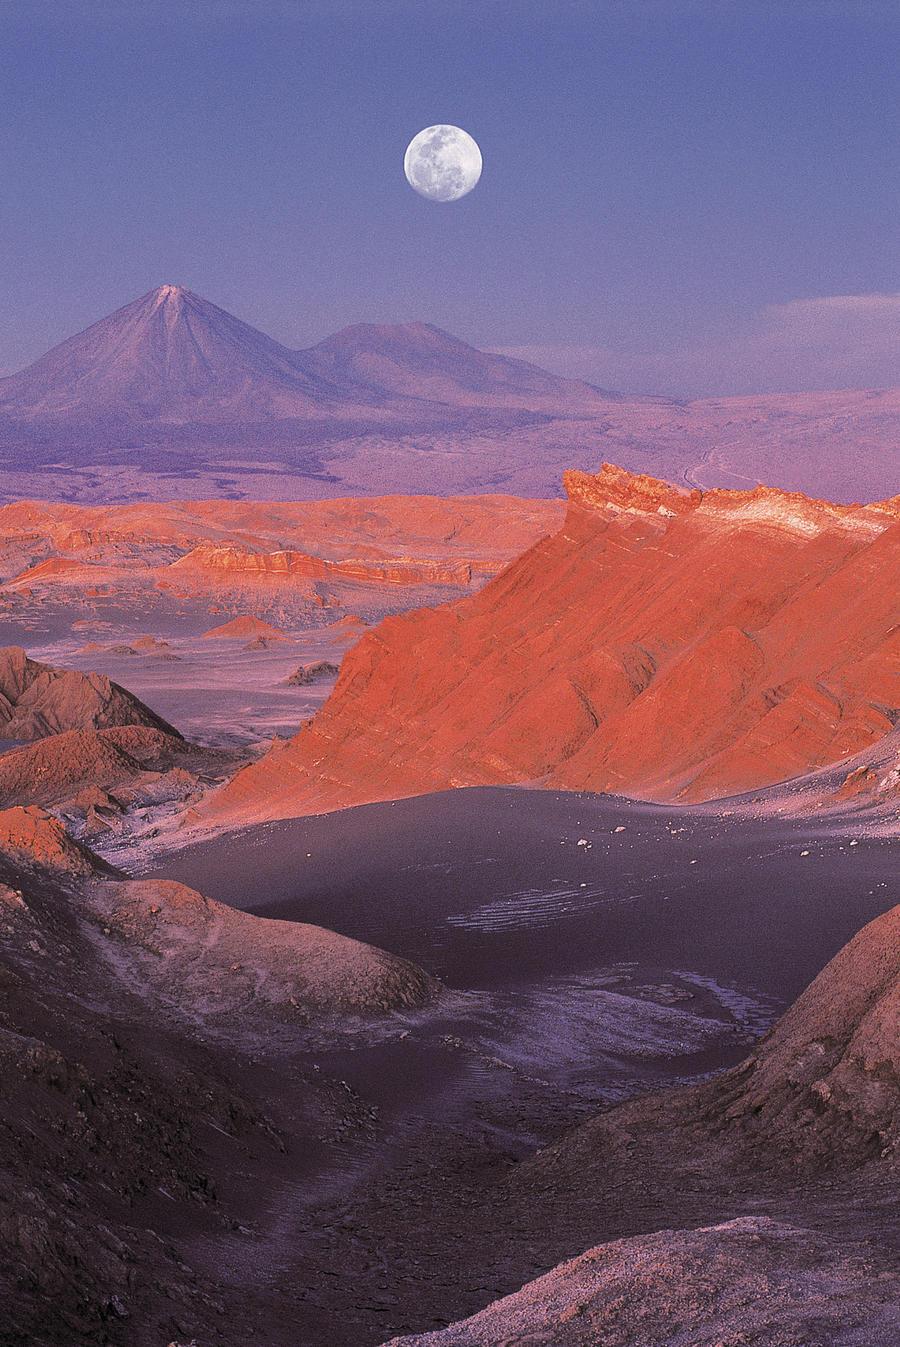 Desierto de Atacama Chile by Vk30